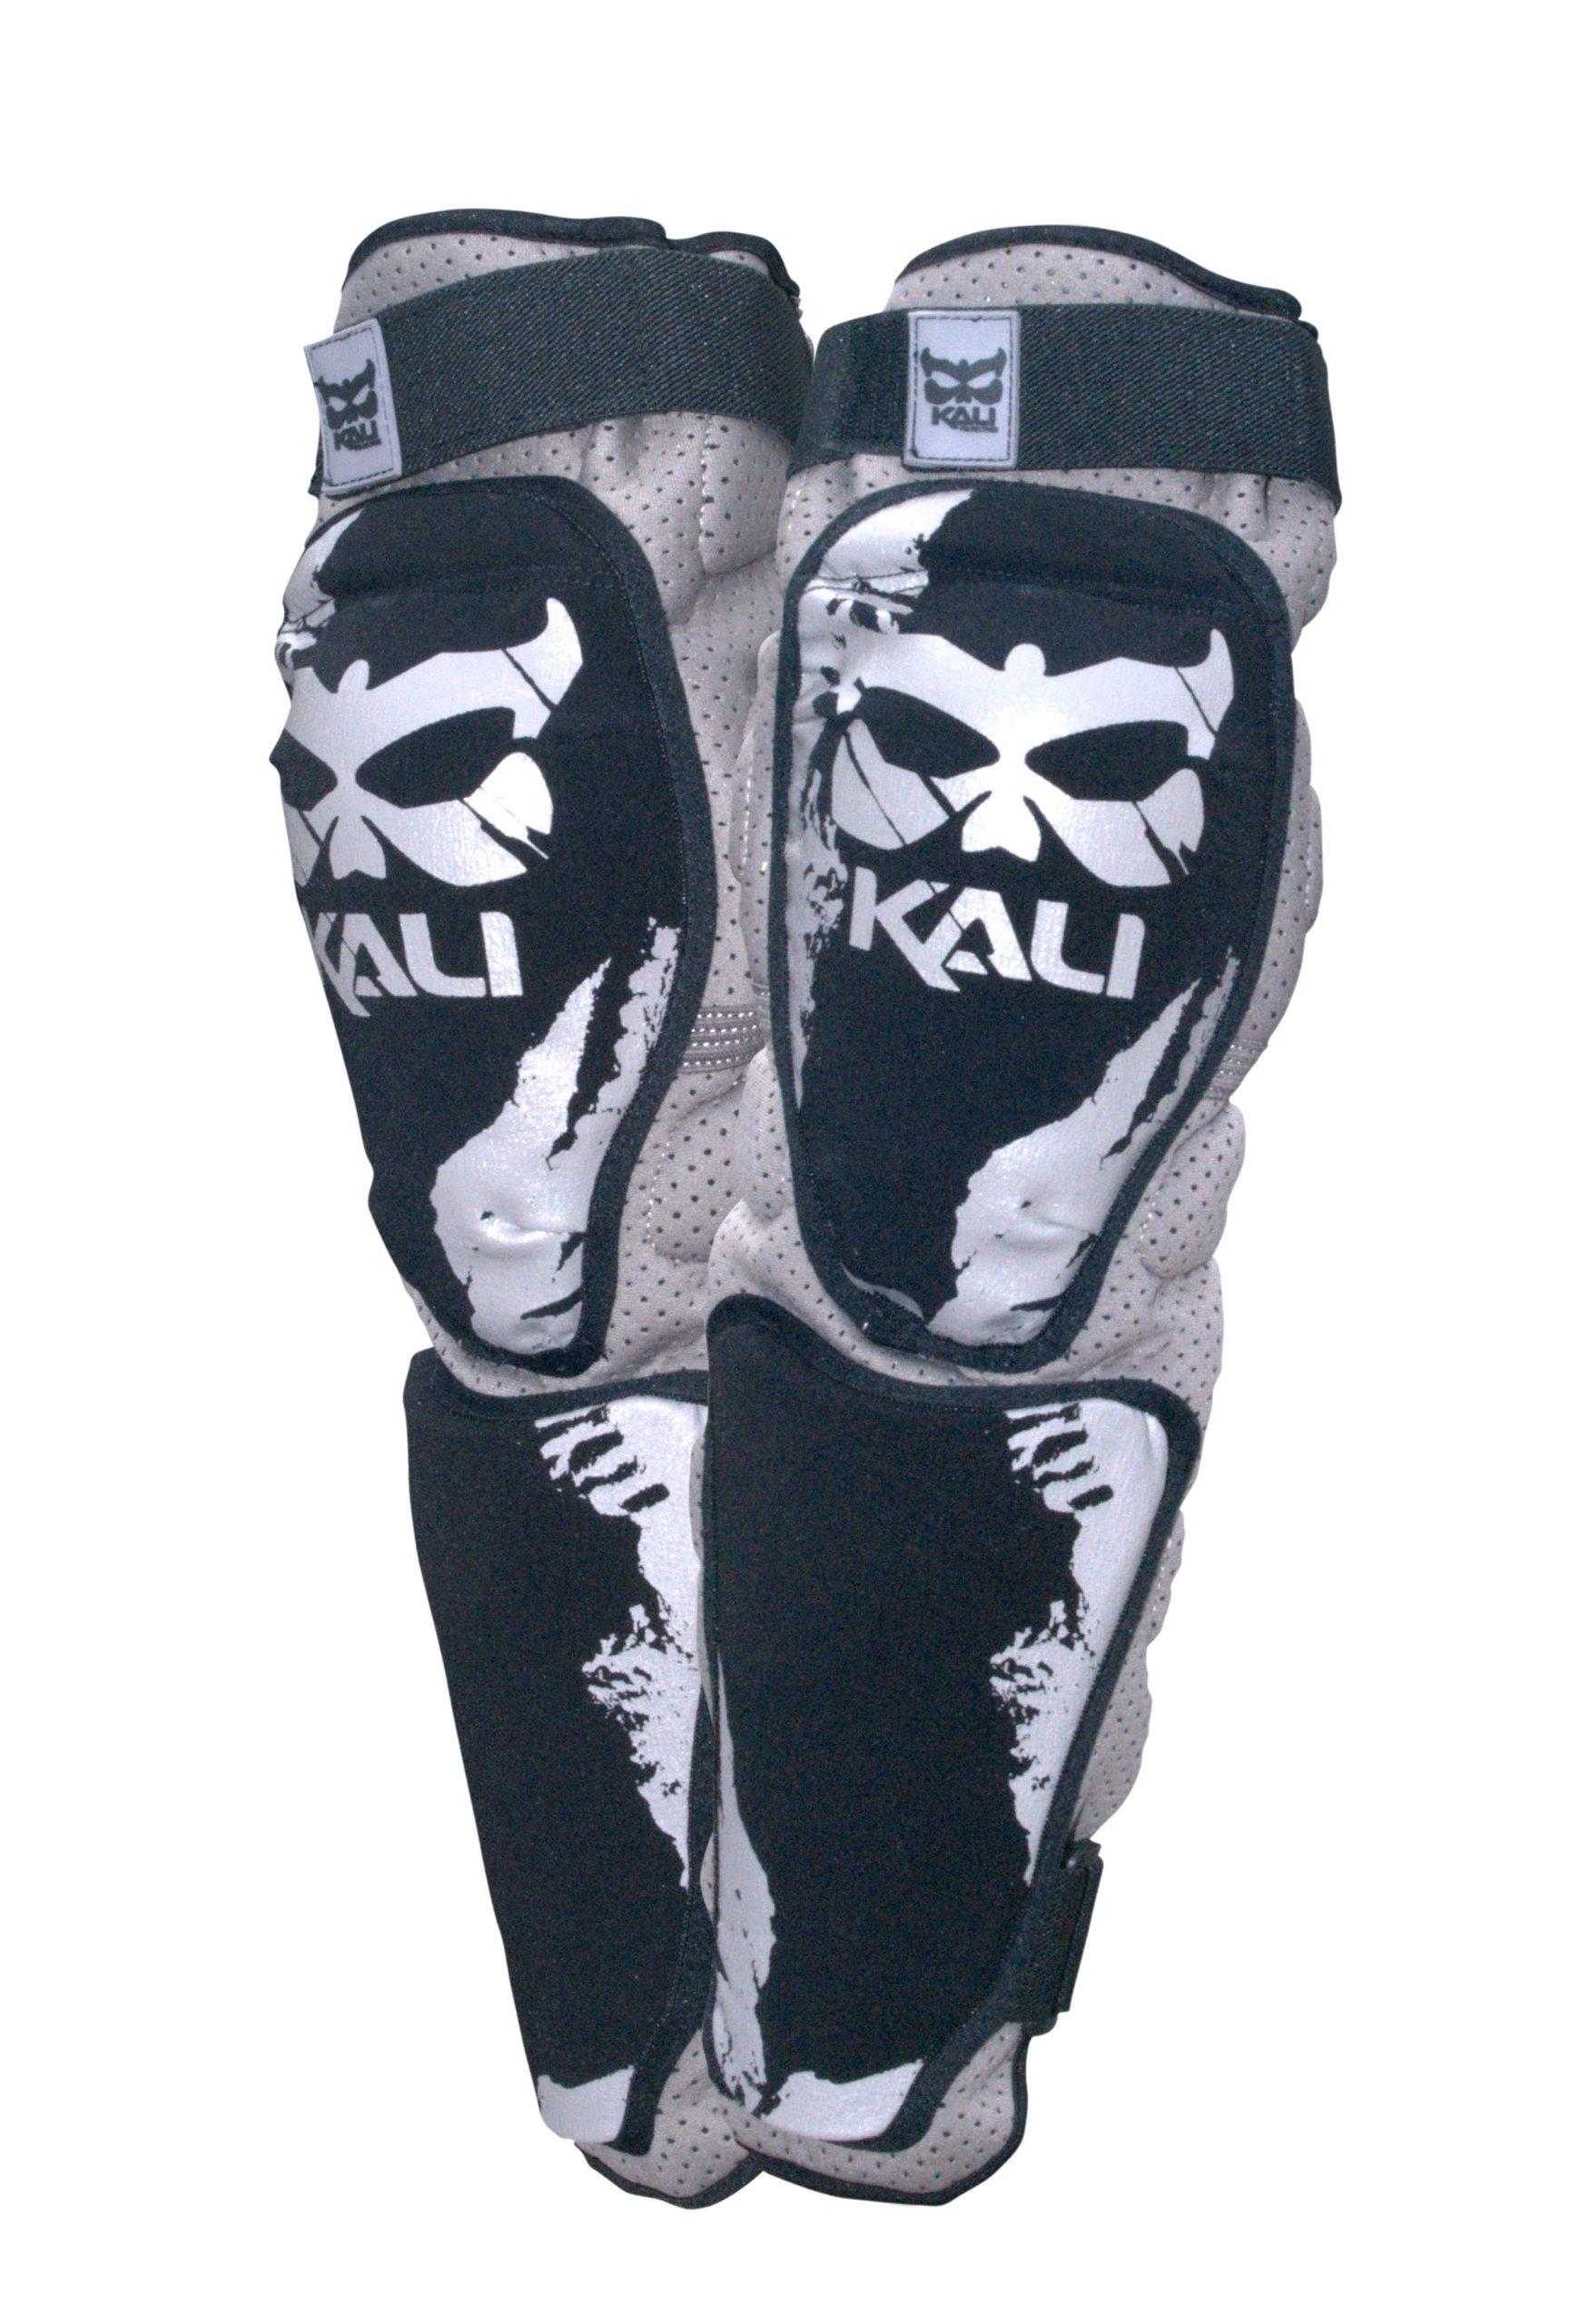 Kali Protectives Aazis Plus 180 Soft Knee/Shin Guard, Torn, Medium